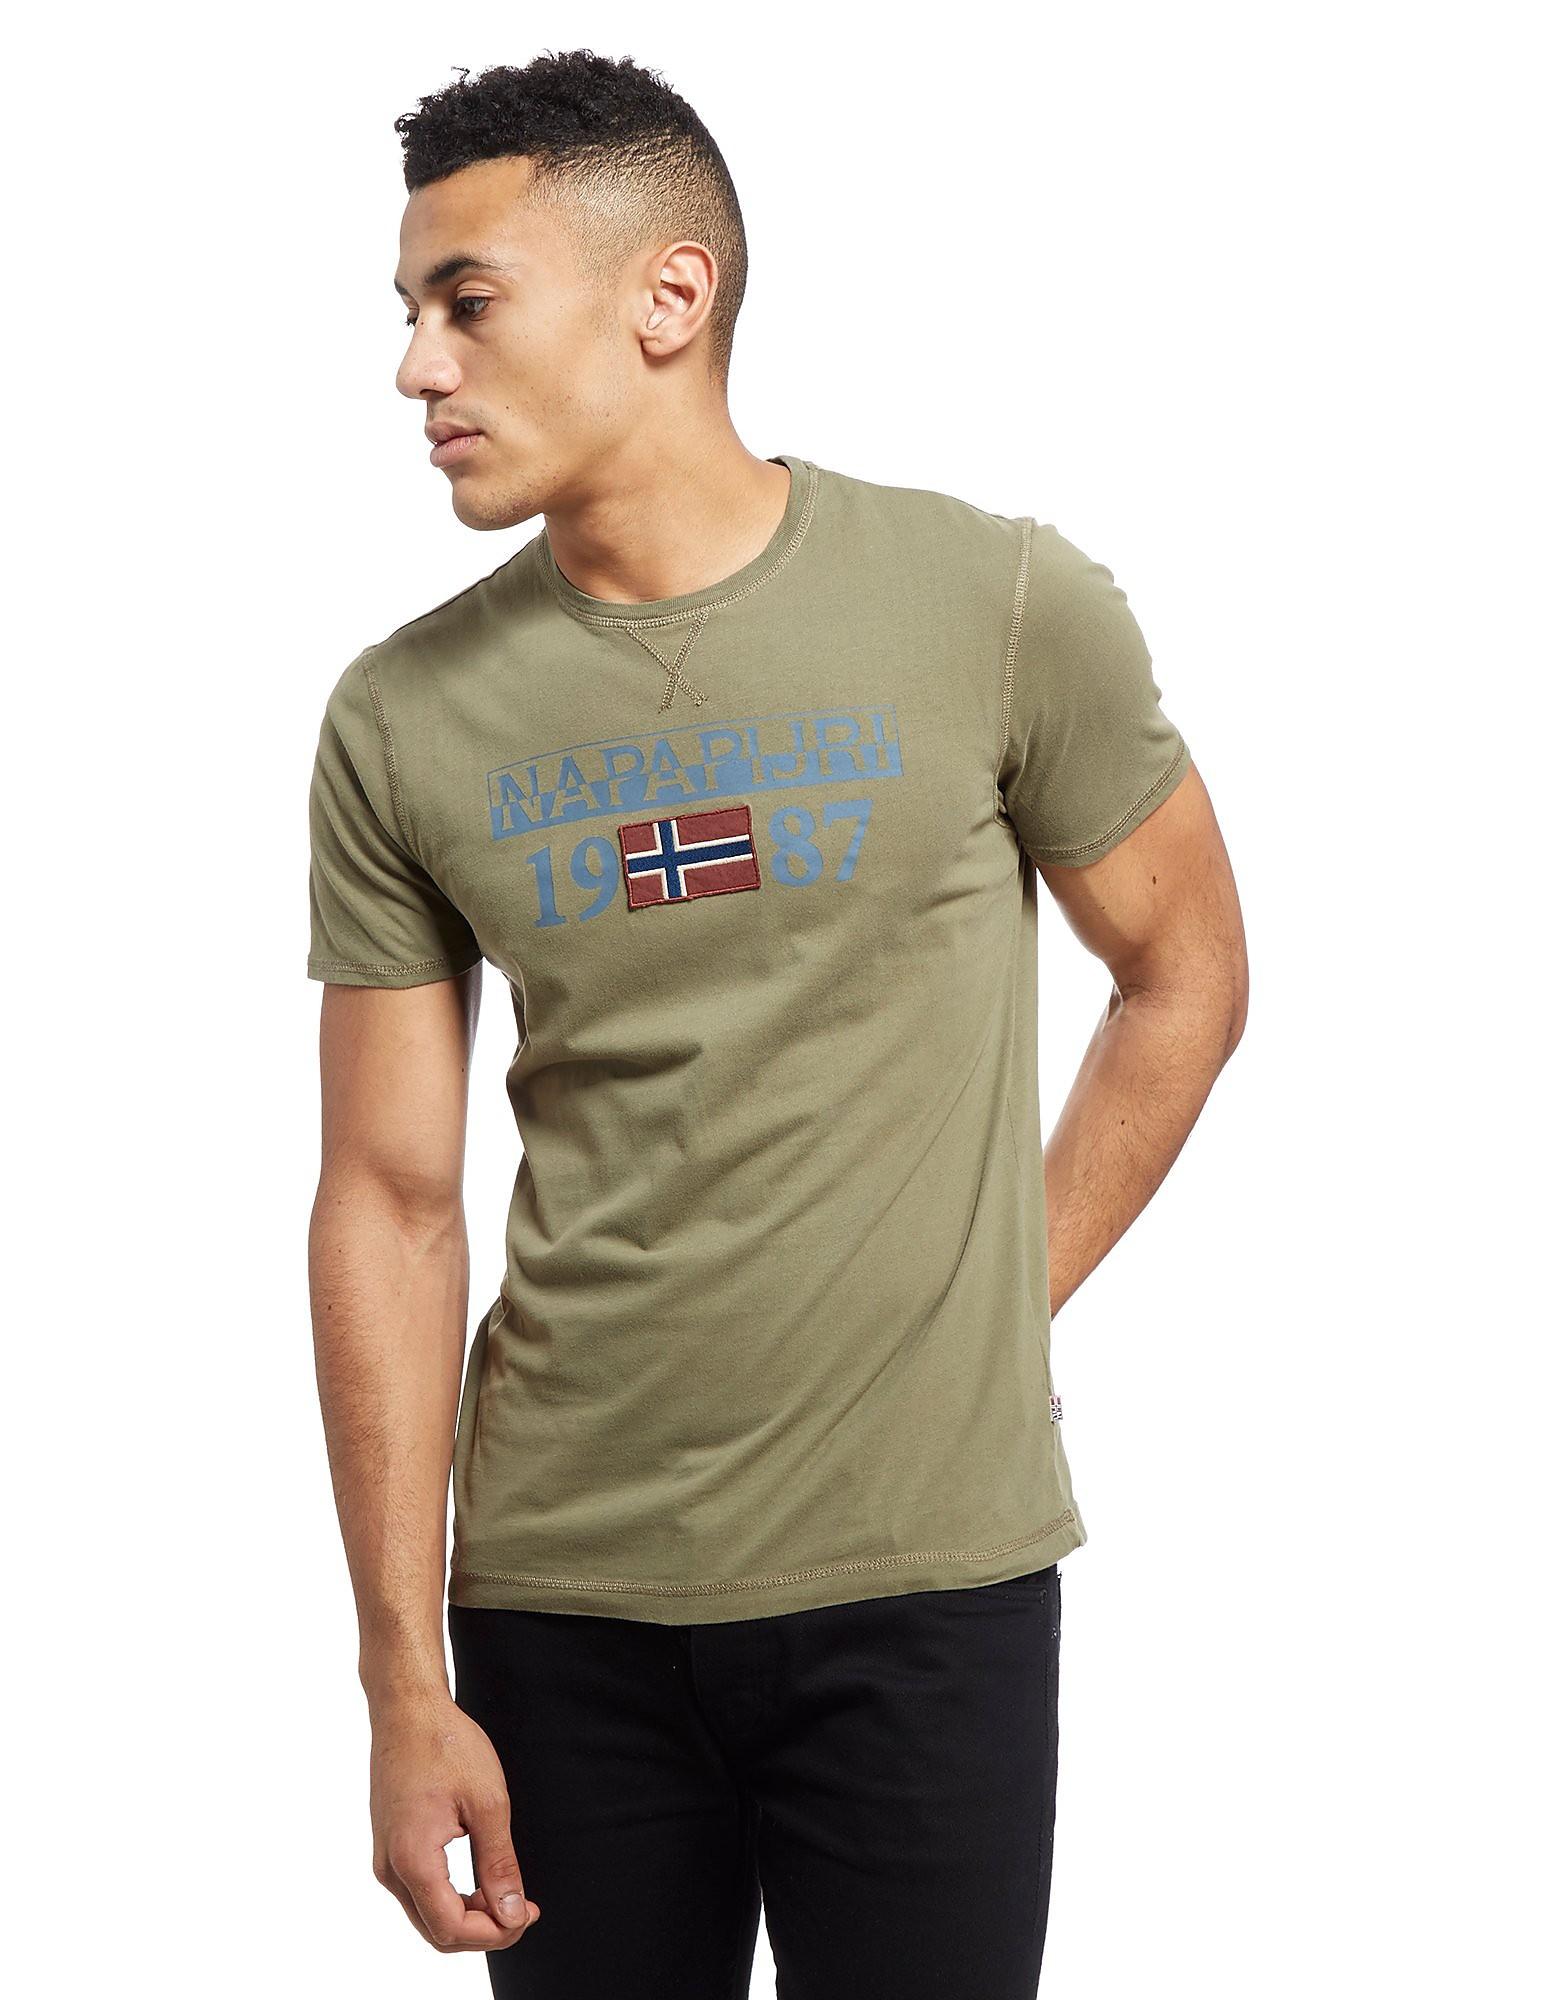 Napapijri Core Logo Short Sleeve T-Shirt - Green, Green